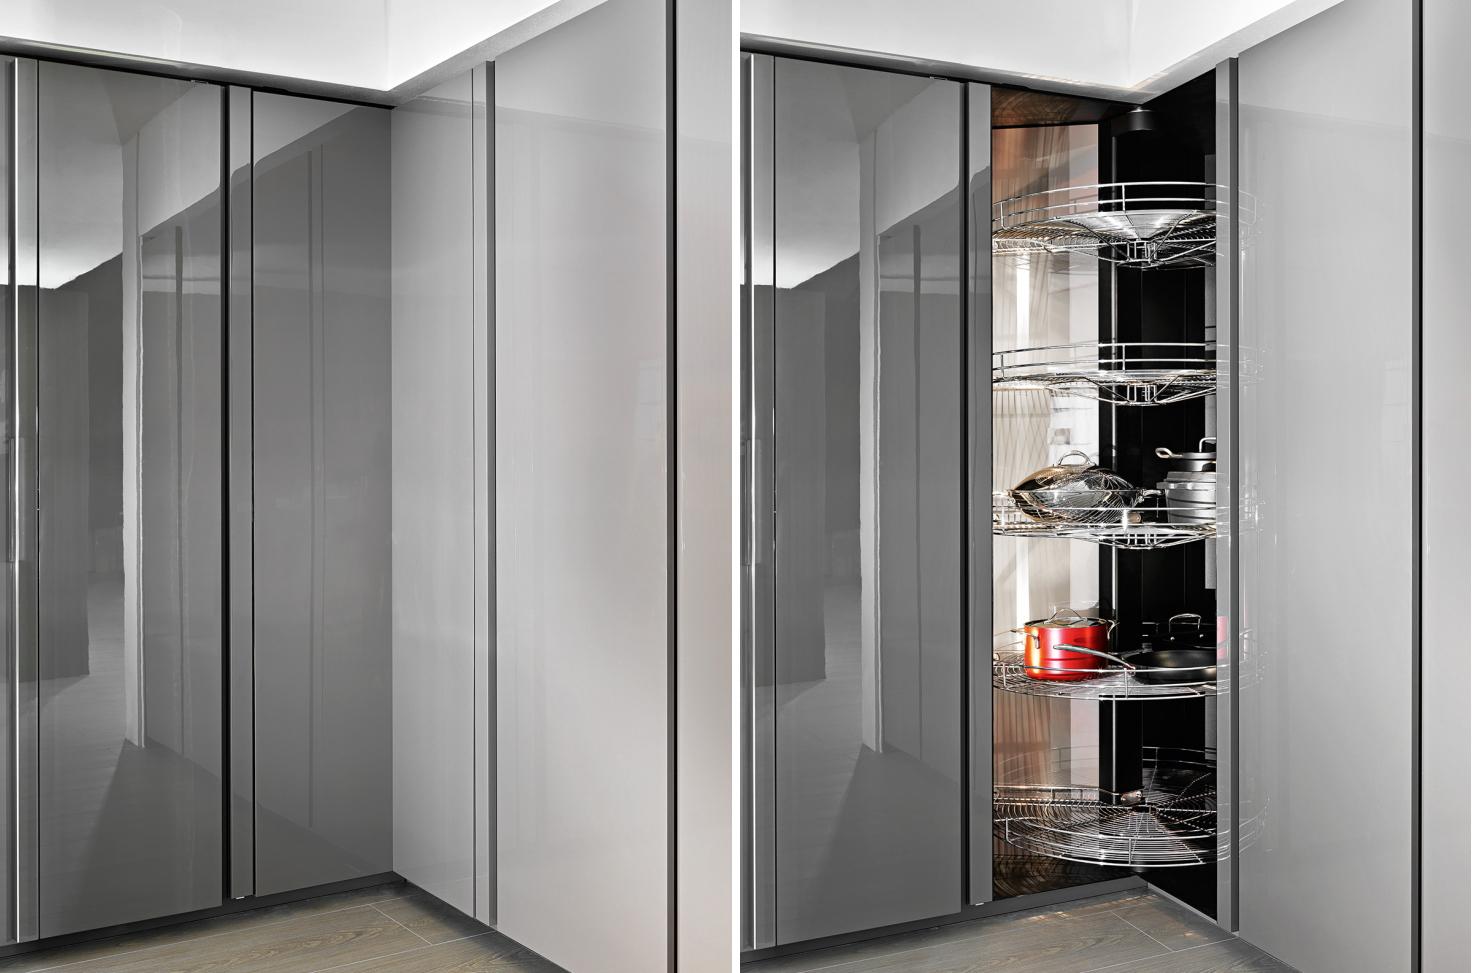 Mobili cucina ad angolo latest with mobili cucina ad - Mobili cucina ad angolo ...